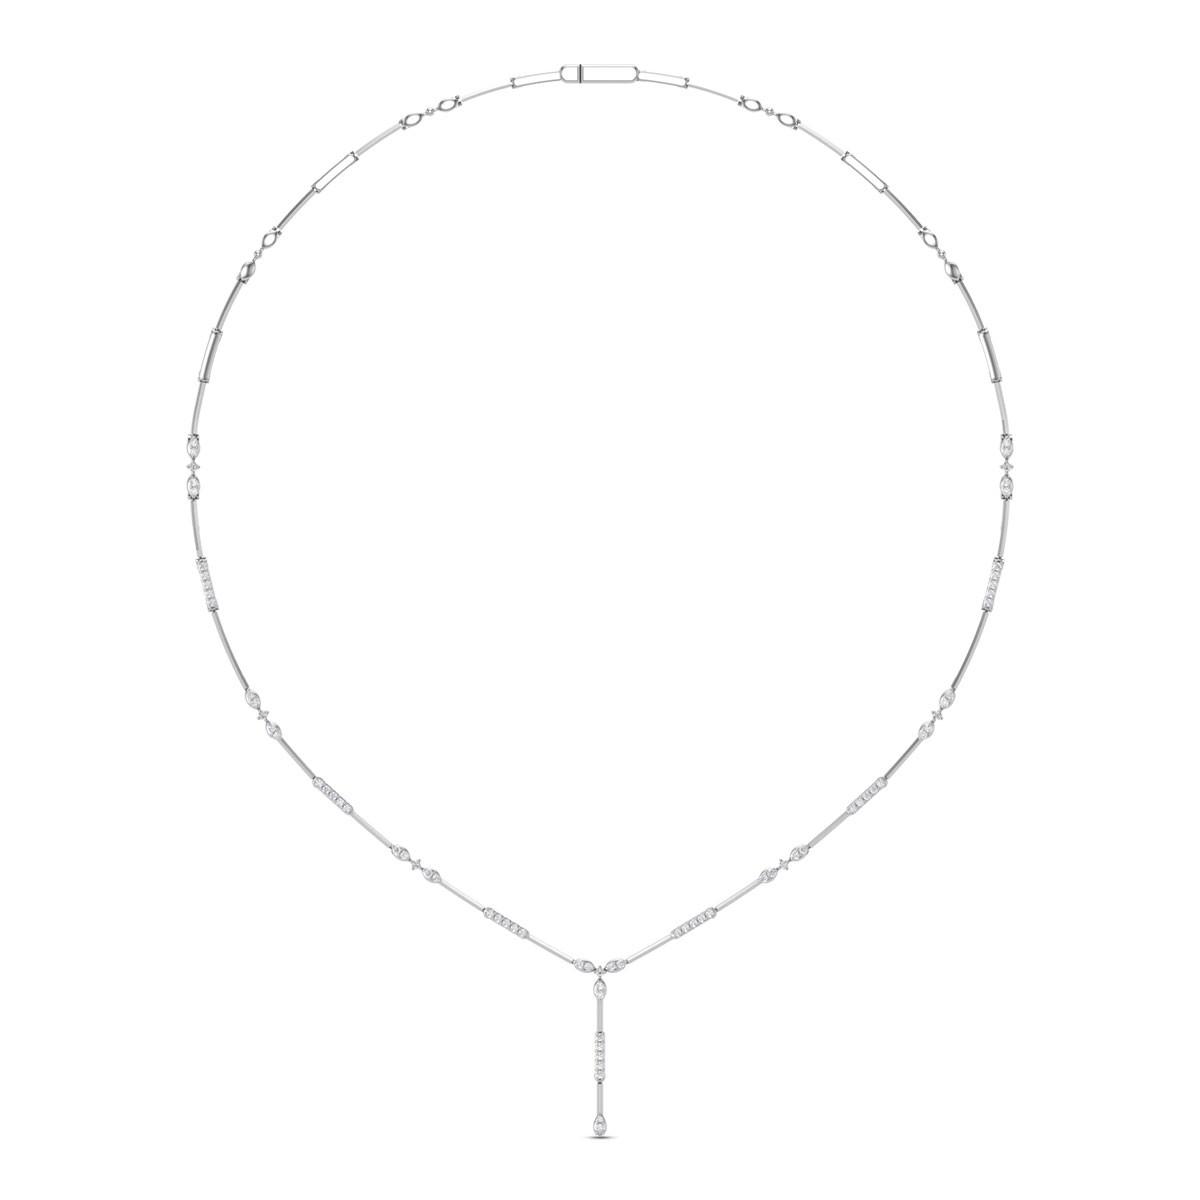 Diamond Necklace DJNC5127